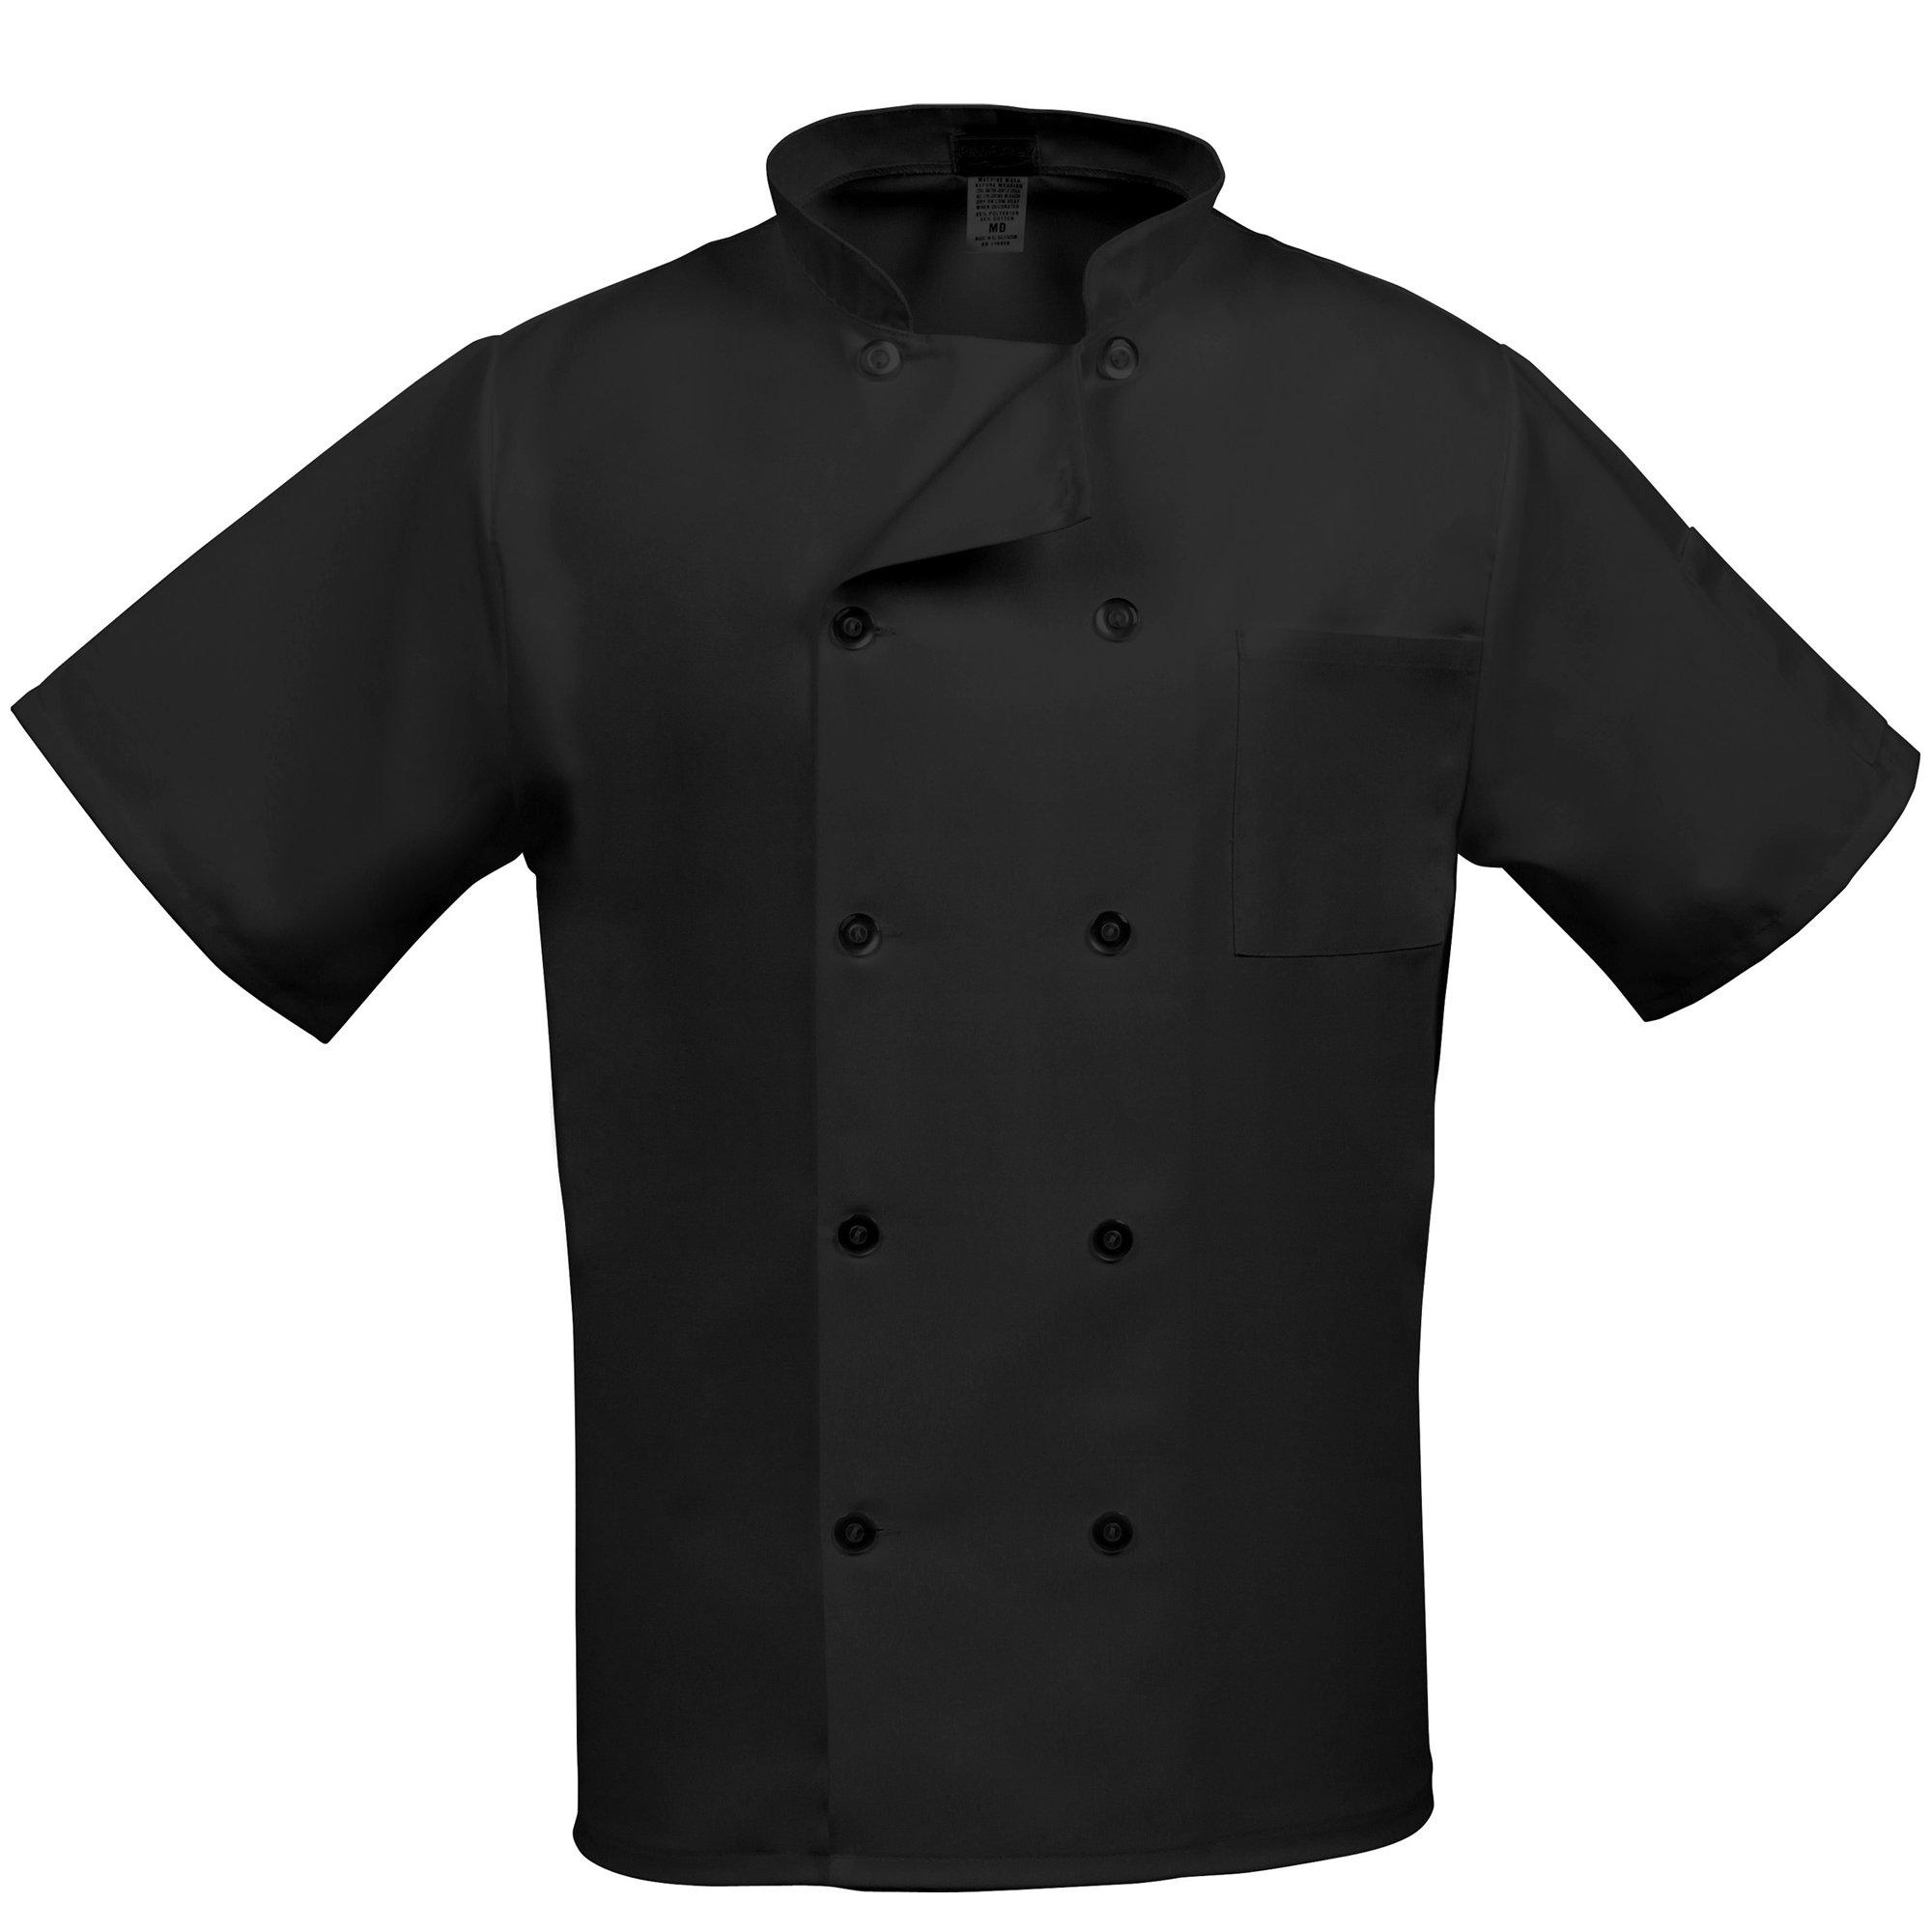 Fame Adult's Short Sleeve Chef coat -Black-XL